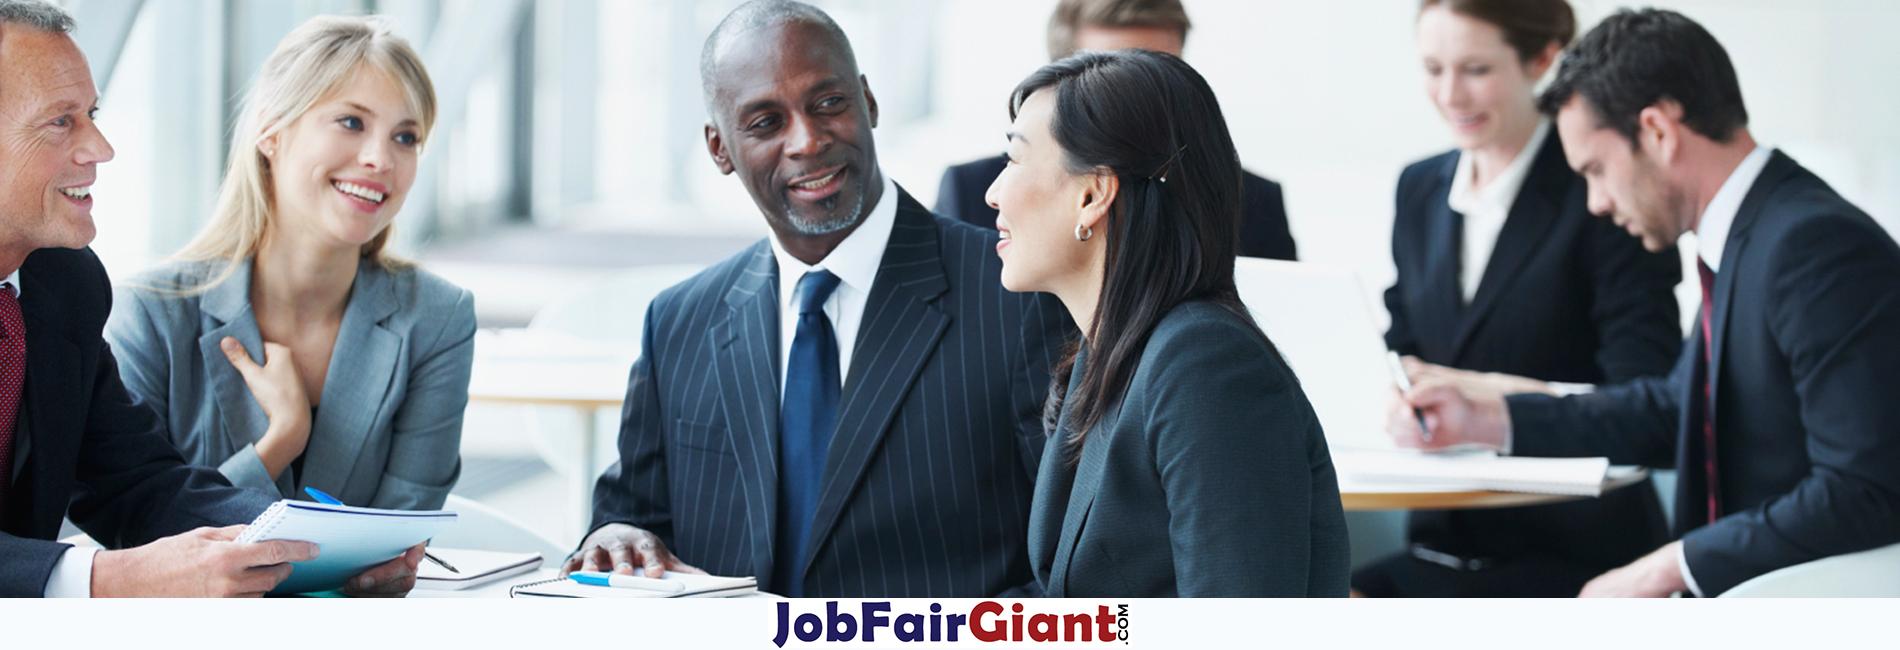 Detroit Job Expo | Michigan Careers Fairs - Novi Job Fairs